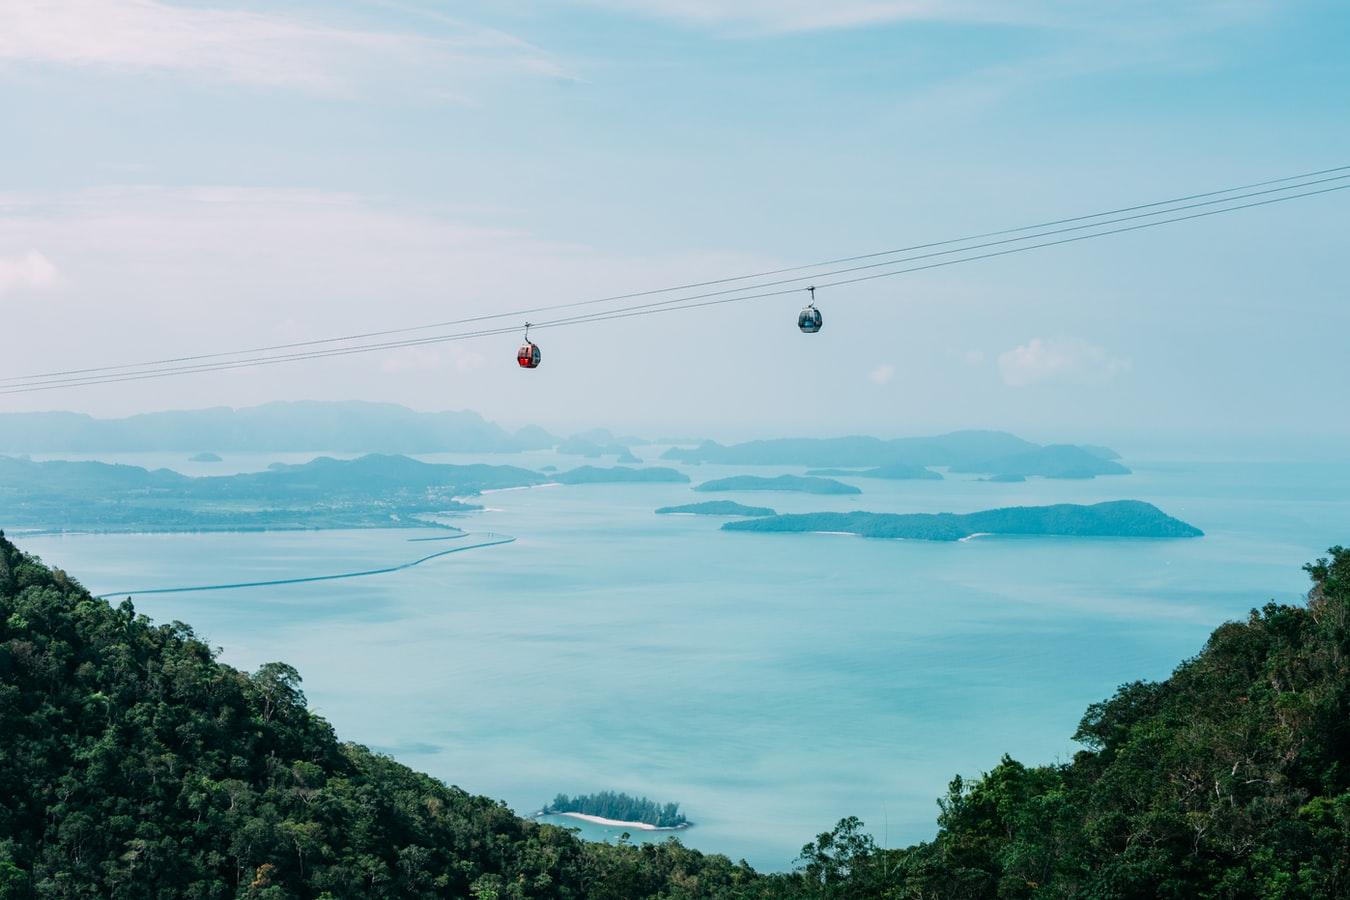 Blick auf seilbahn zur Sky-Bridge in Langkawi Malaysia